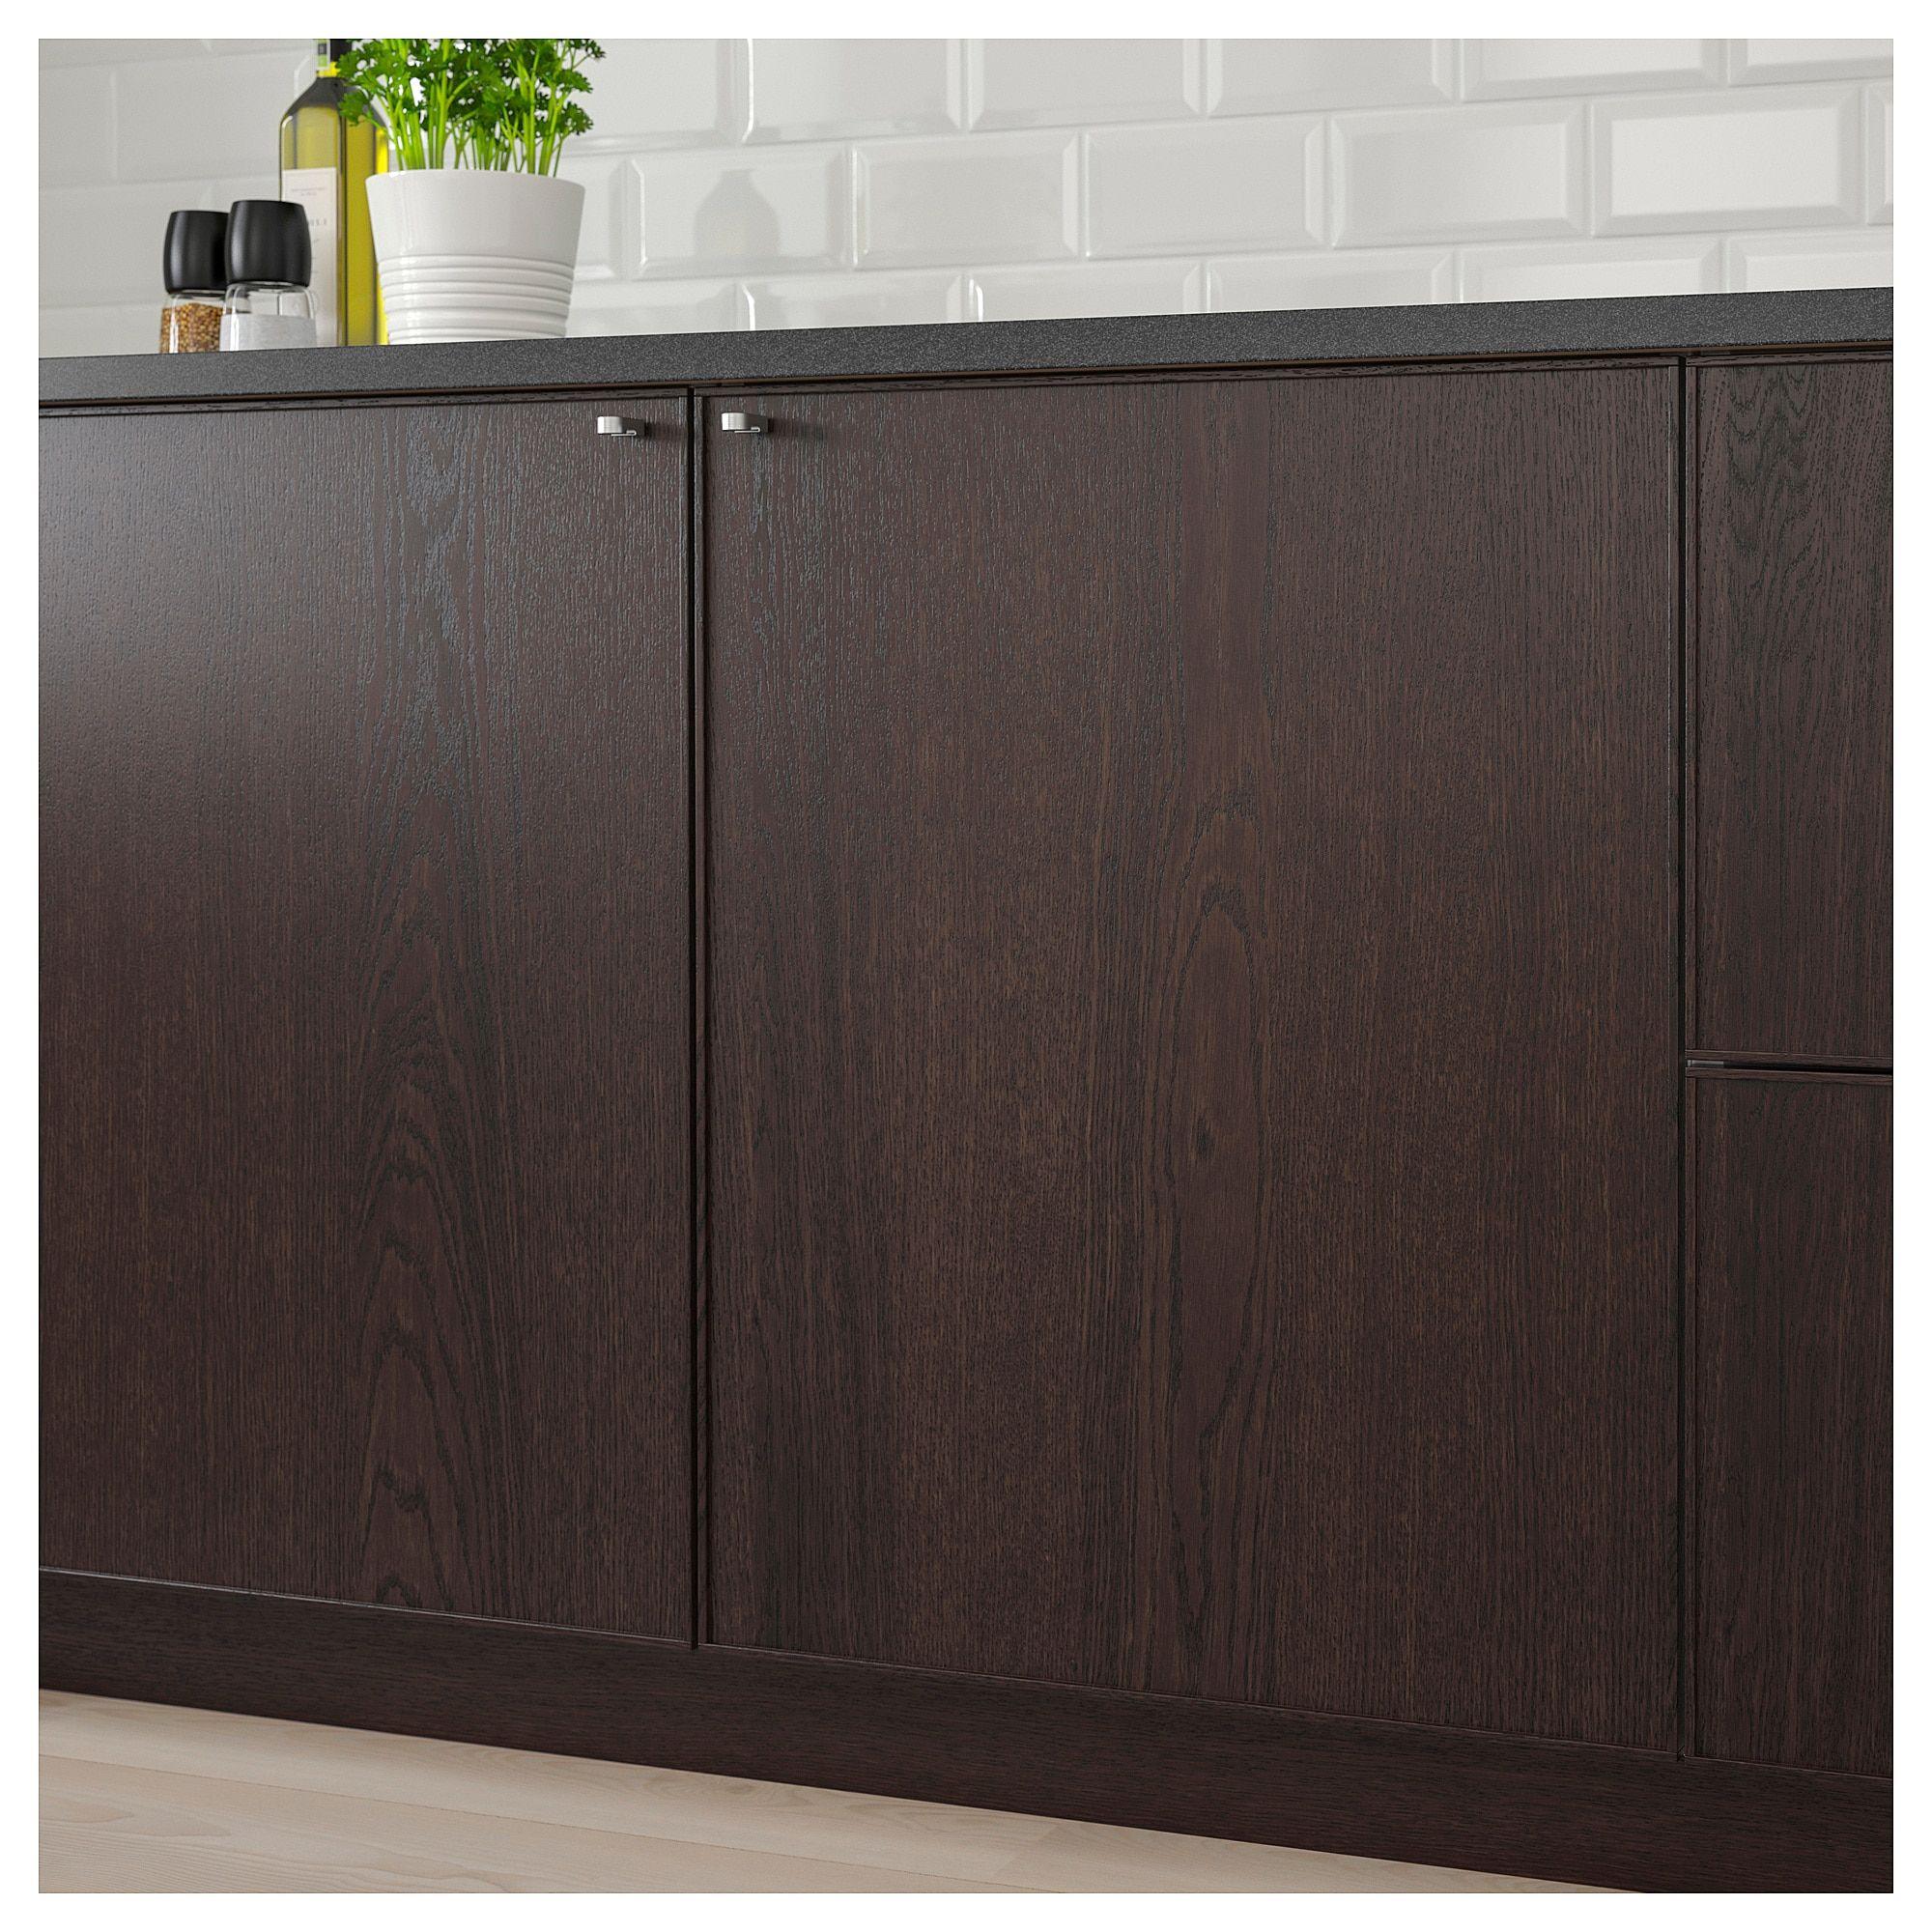 Ikea Kitchen Usa: EKESTAD Door Brown In 2019